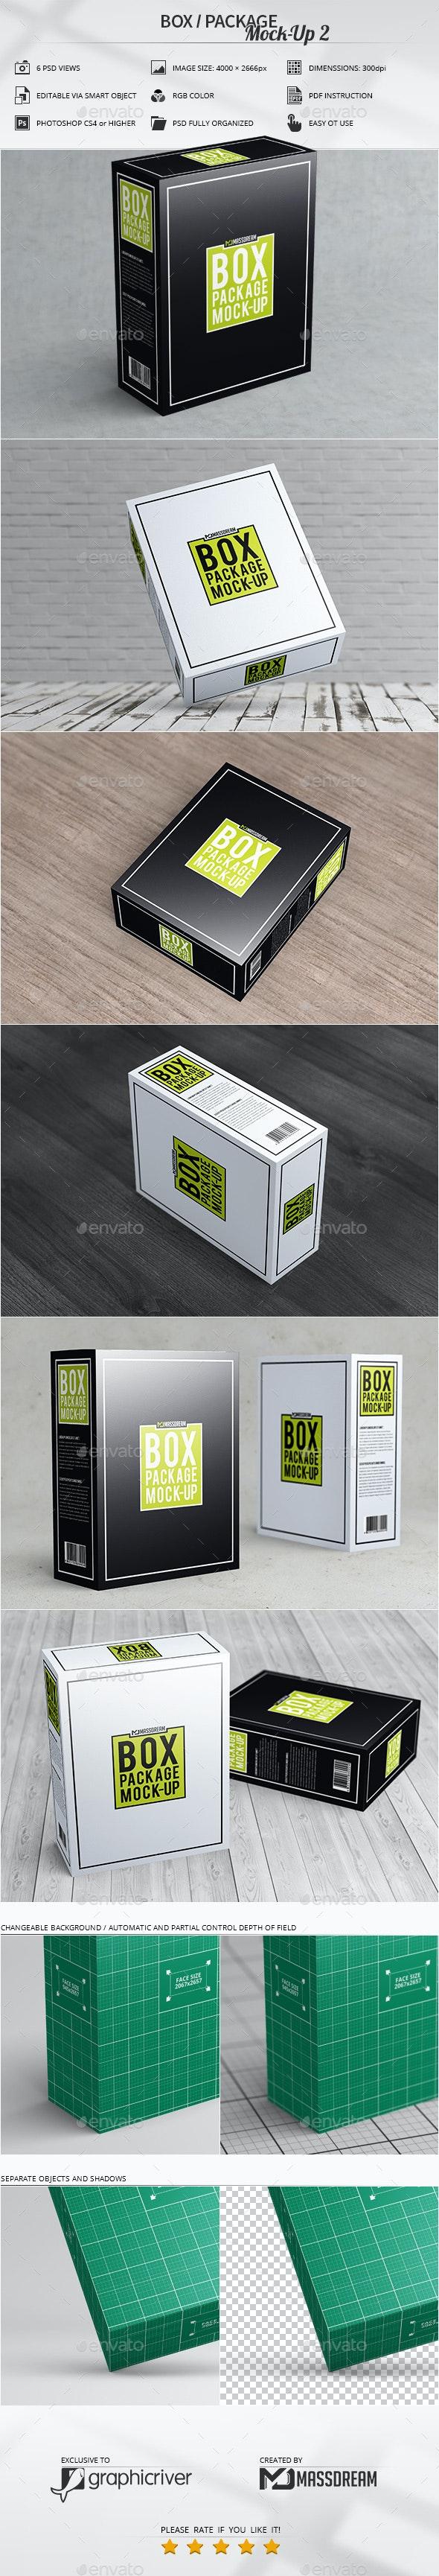 Box / Package Mock-Up 2 - Print Product Mock-Ups